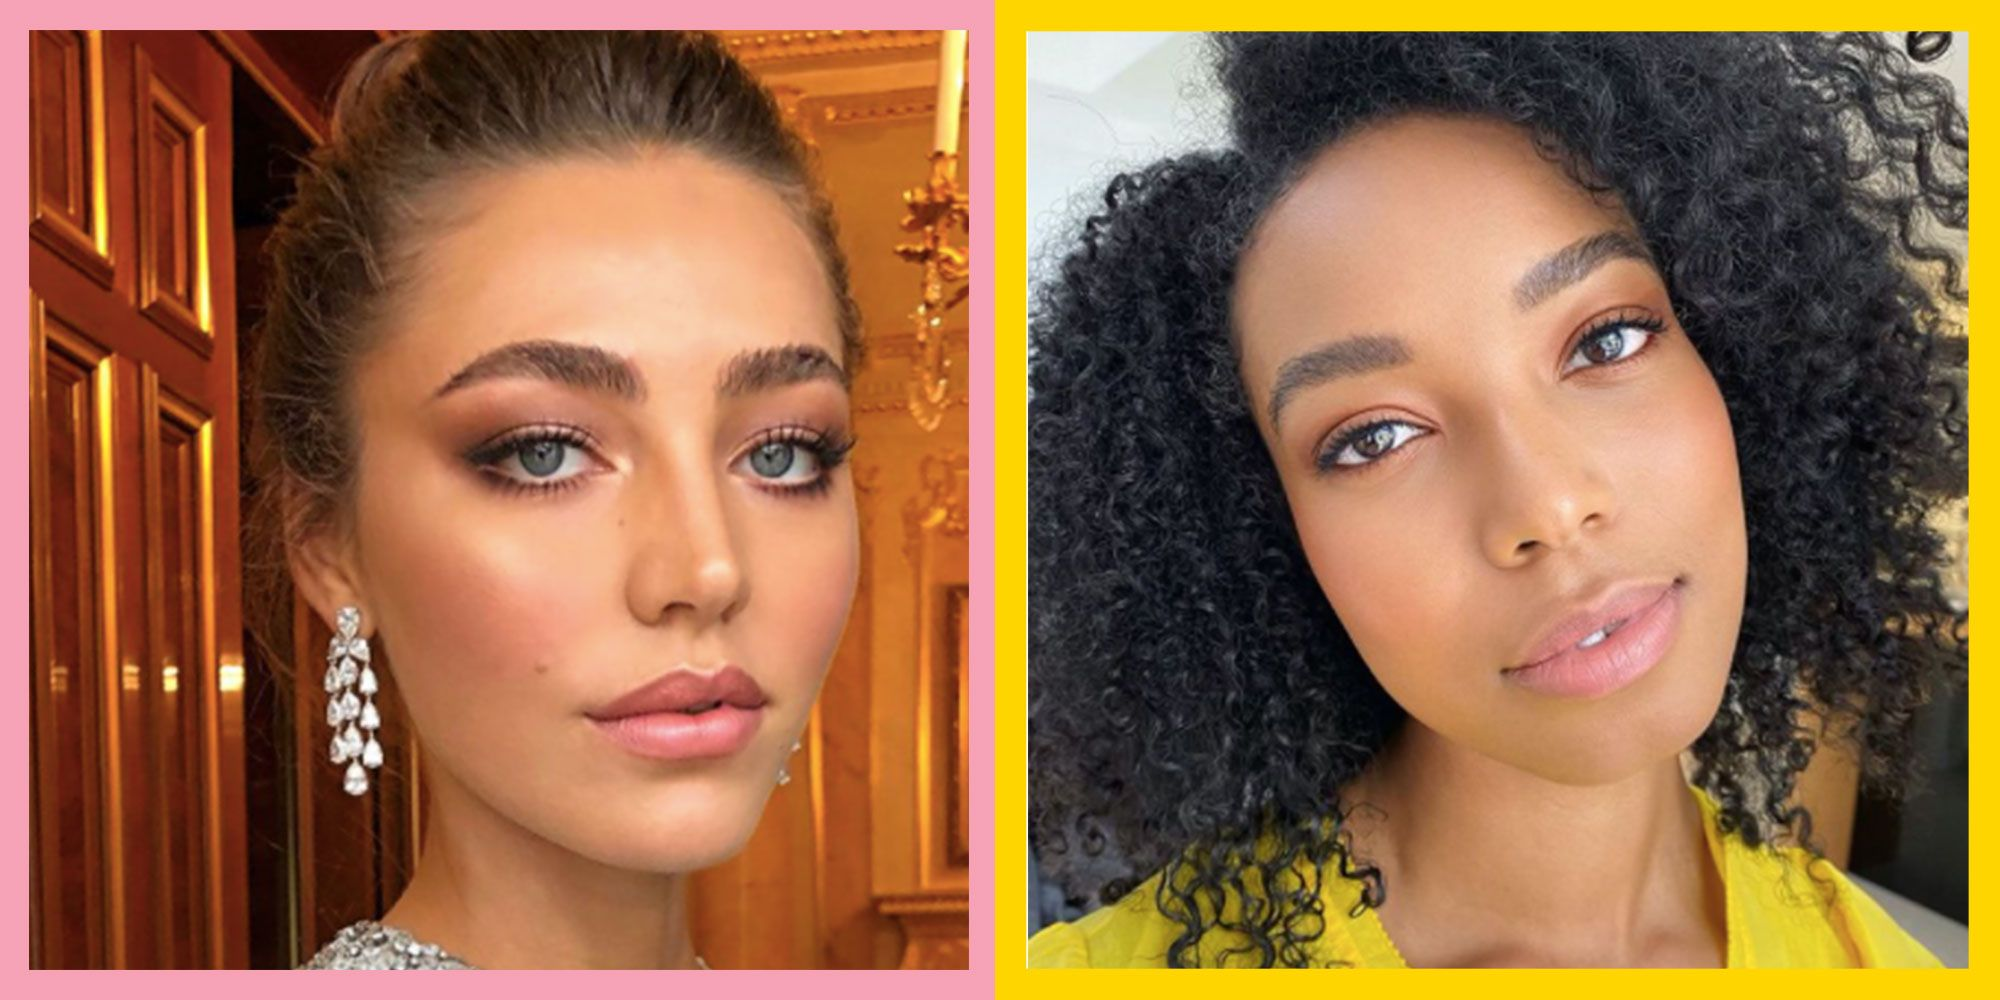 Wedding Makeup Ideas 2021 24 Bridal Beauty Looks We Love